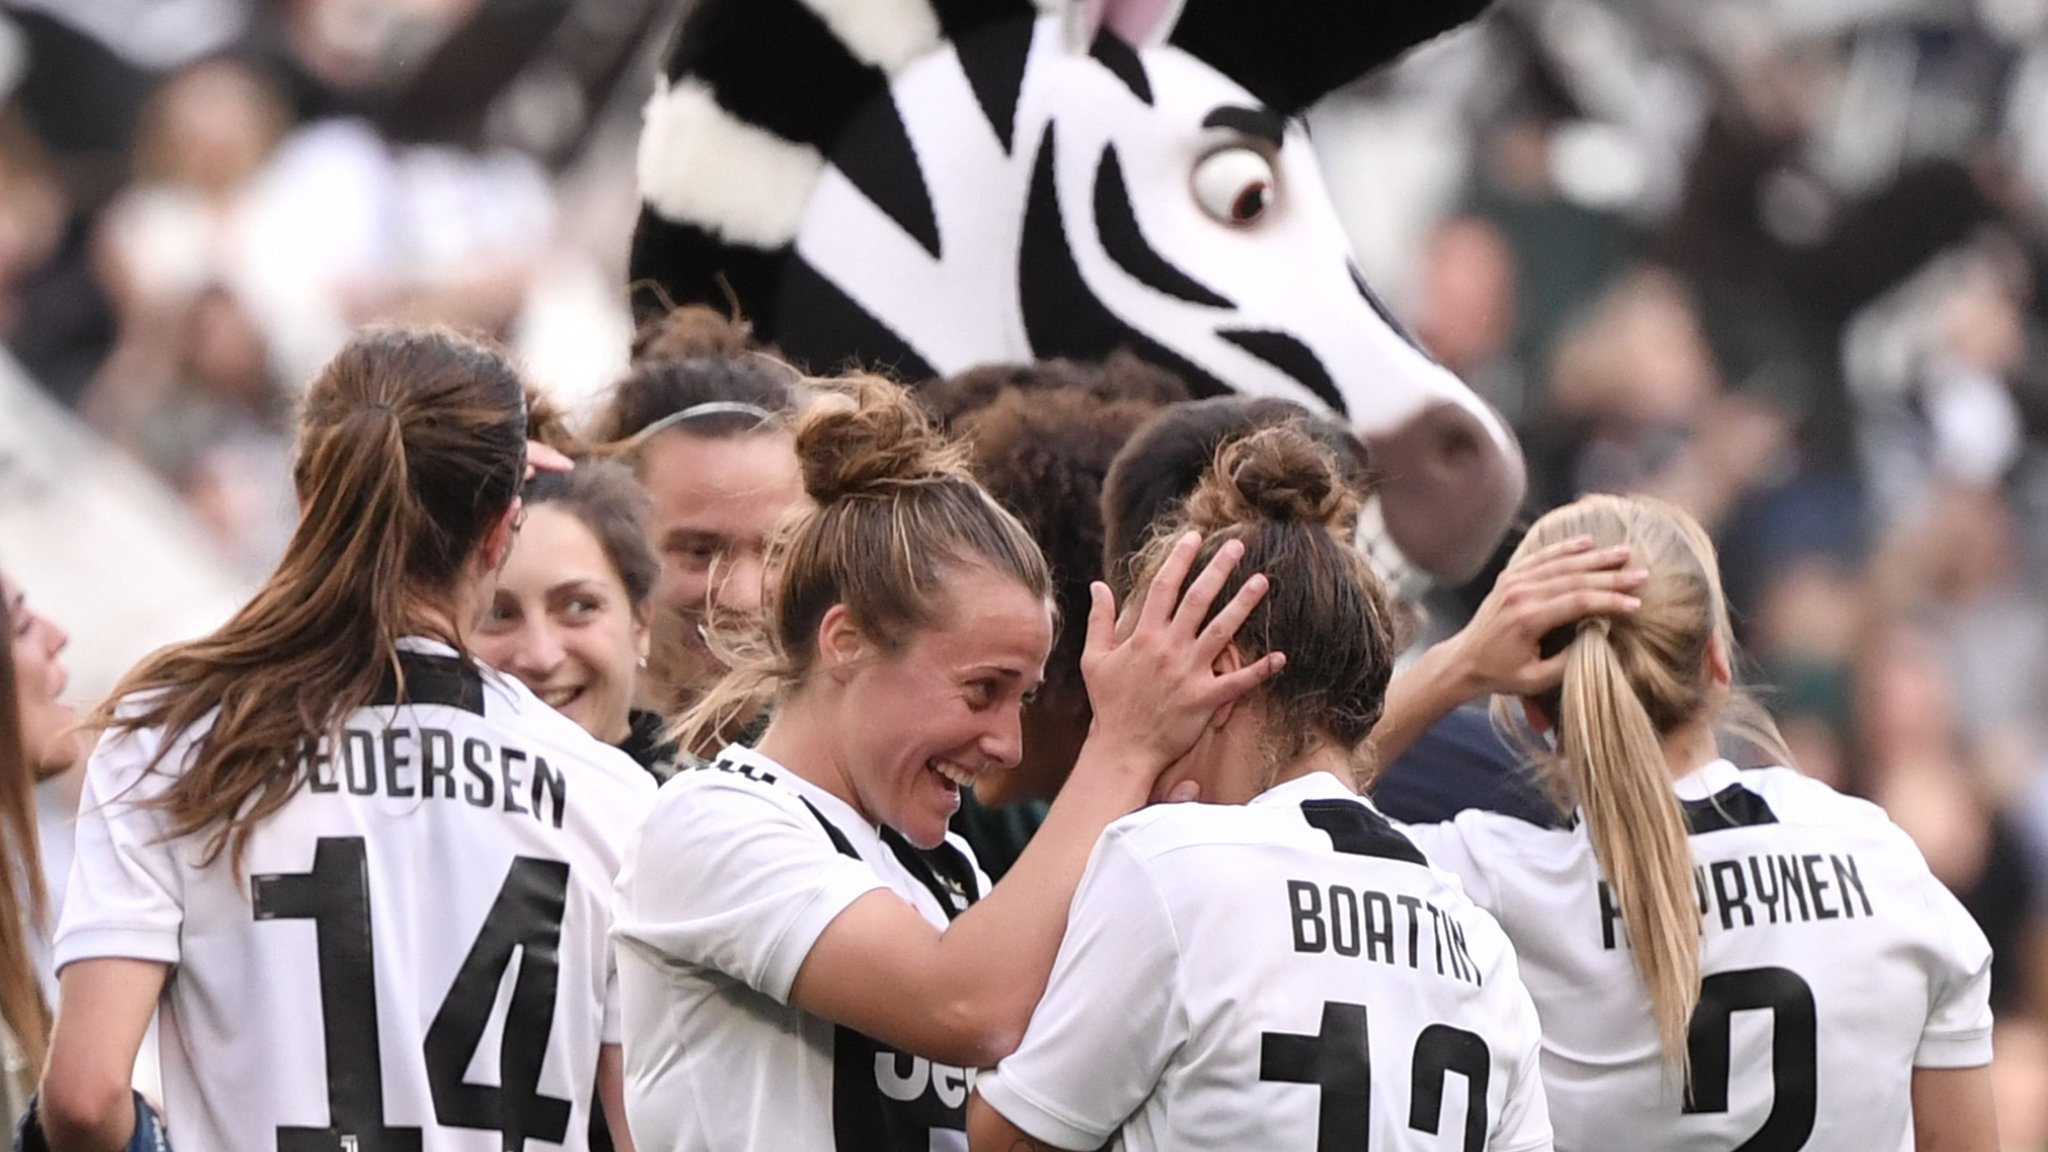 Juventus Women 1-0 Fiorentina: Record crowd of 39,000 watch game at Allianz Stadium